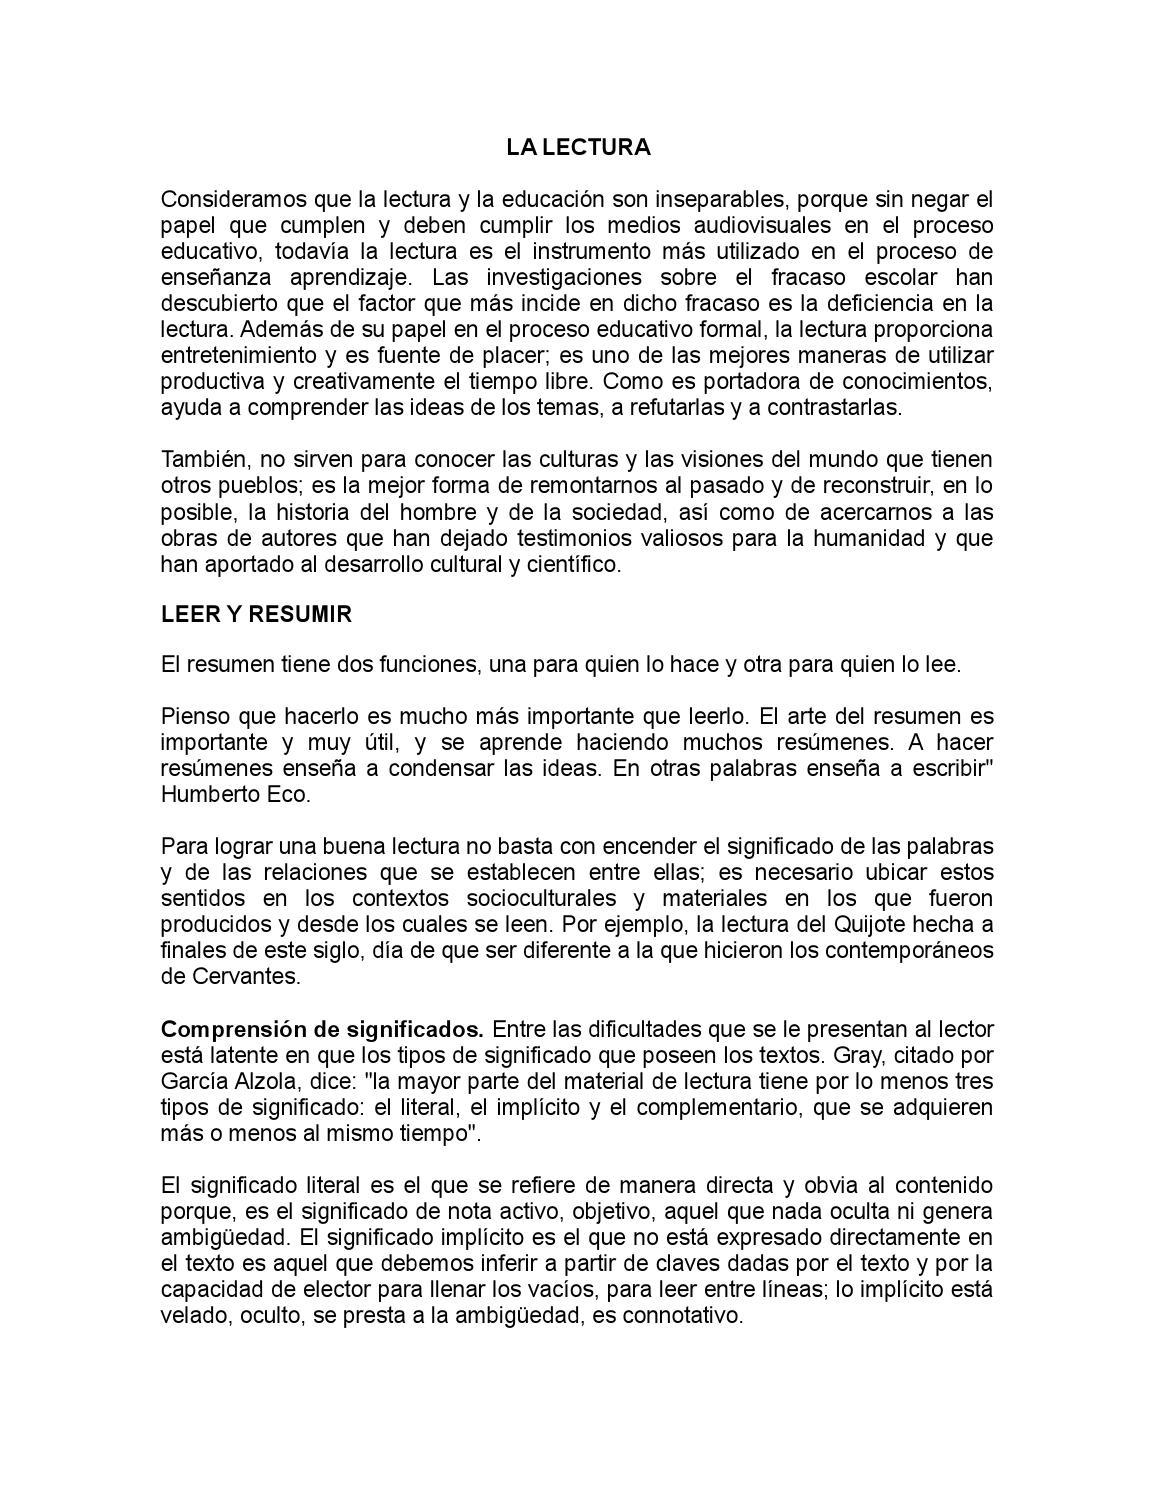 Resumen la lectura by Orlando Cardona Londoño - issuu